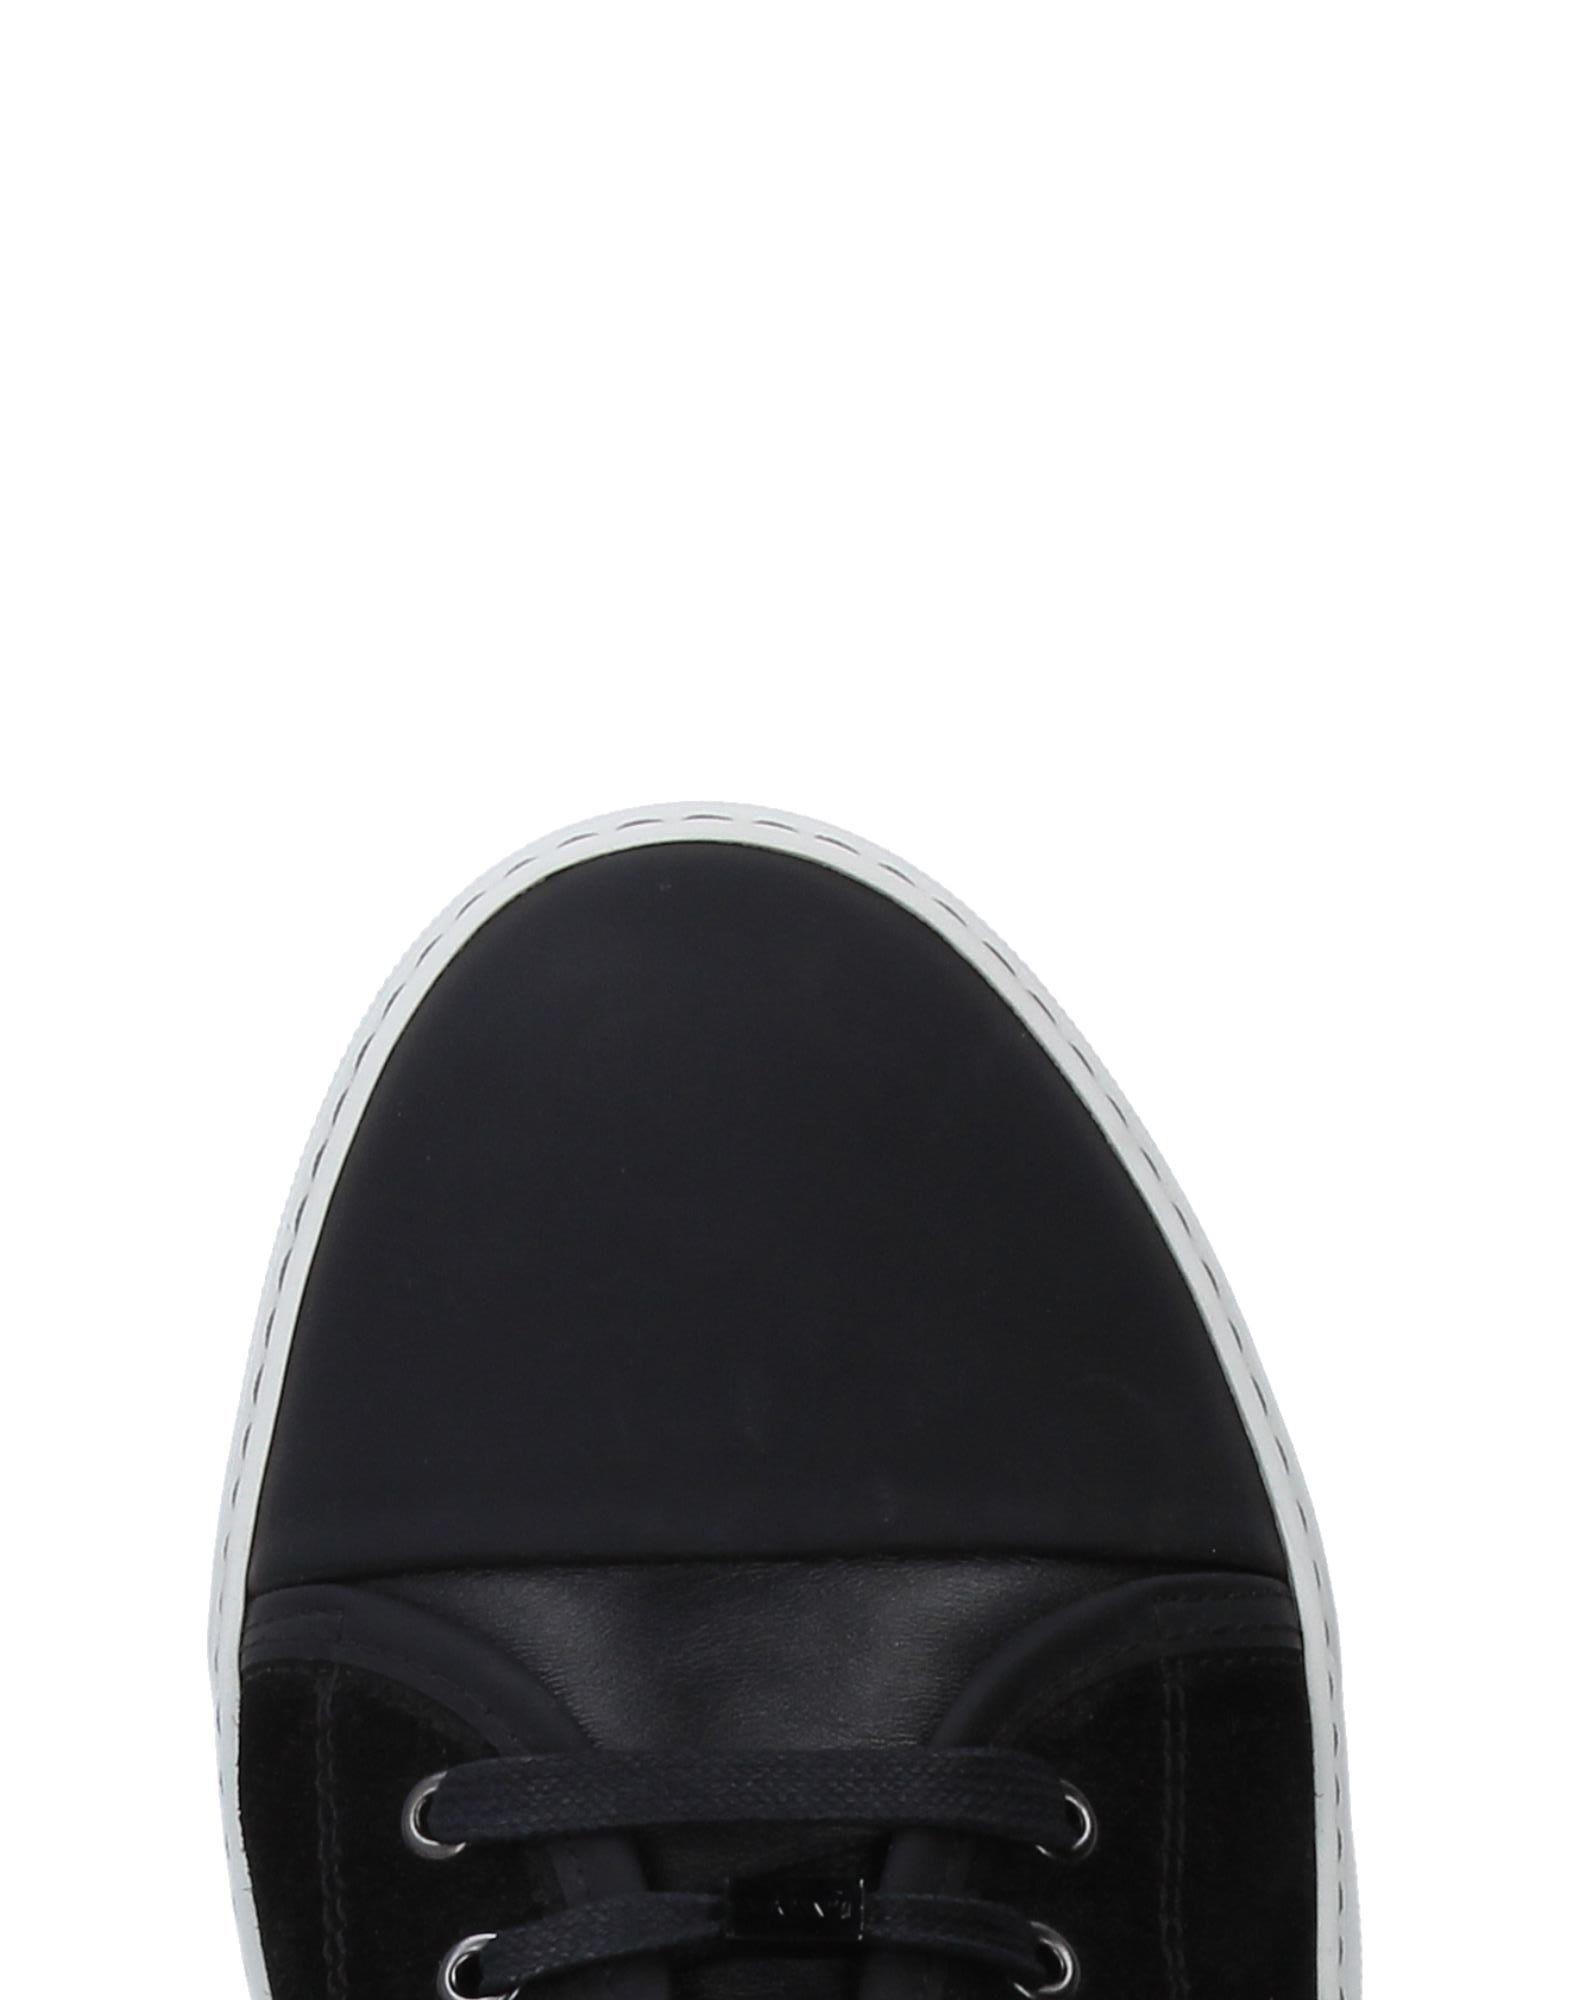 Lanvin Sneakers Herren  11264962WO Gute Qualität beliebte Schuhe